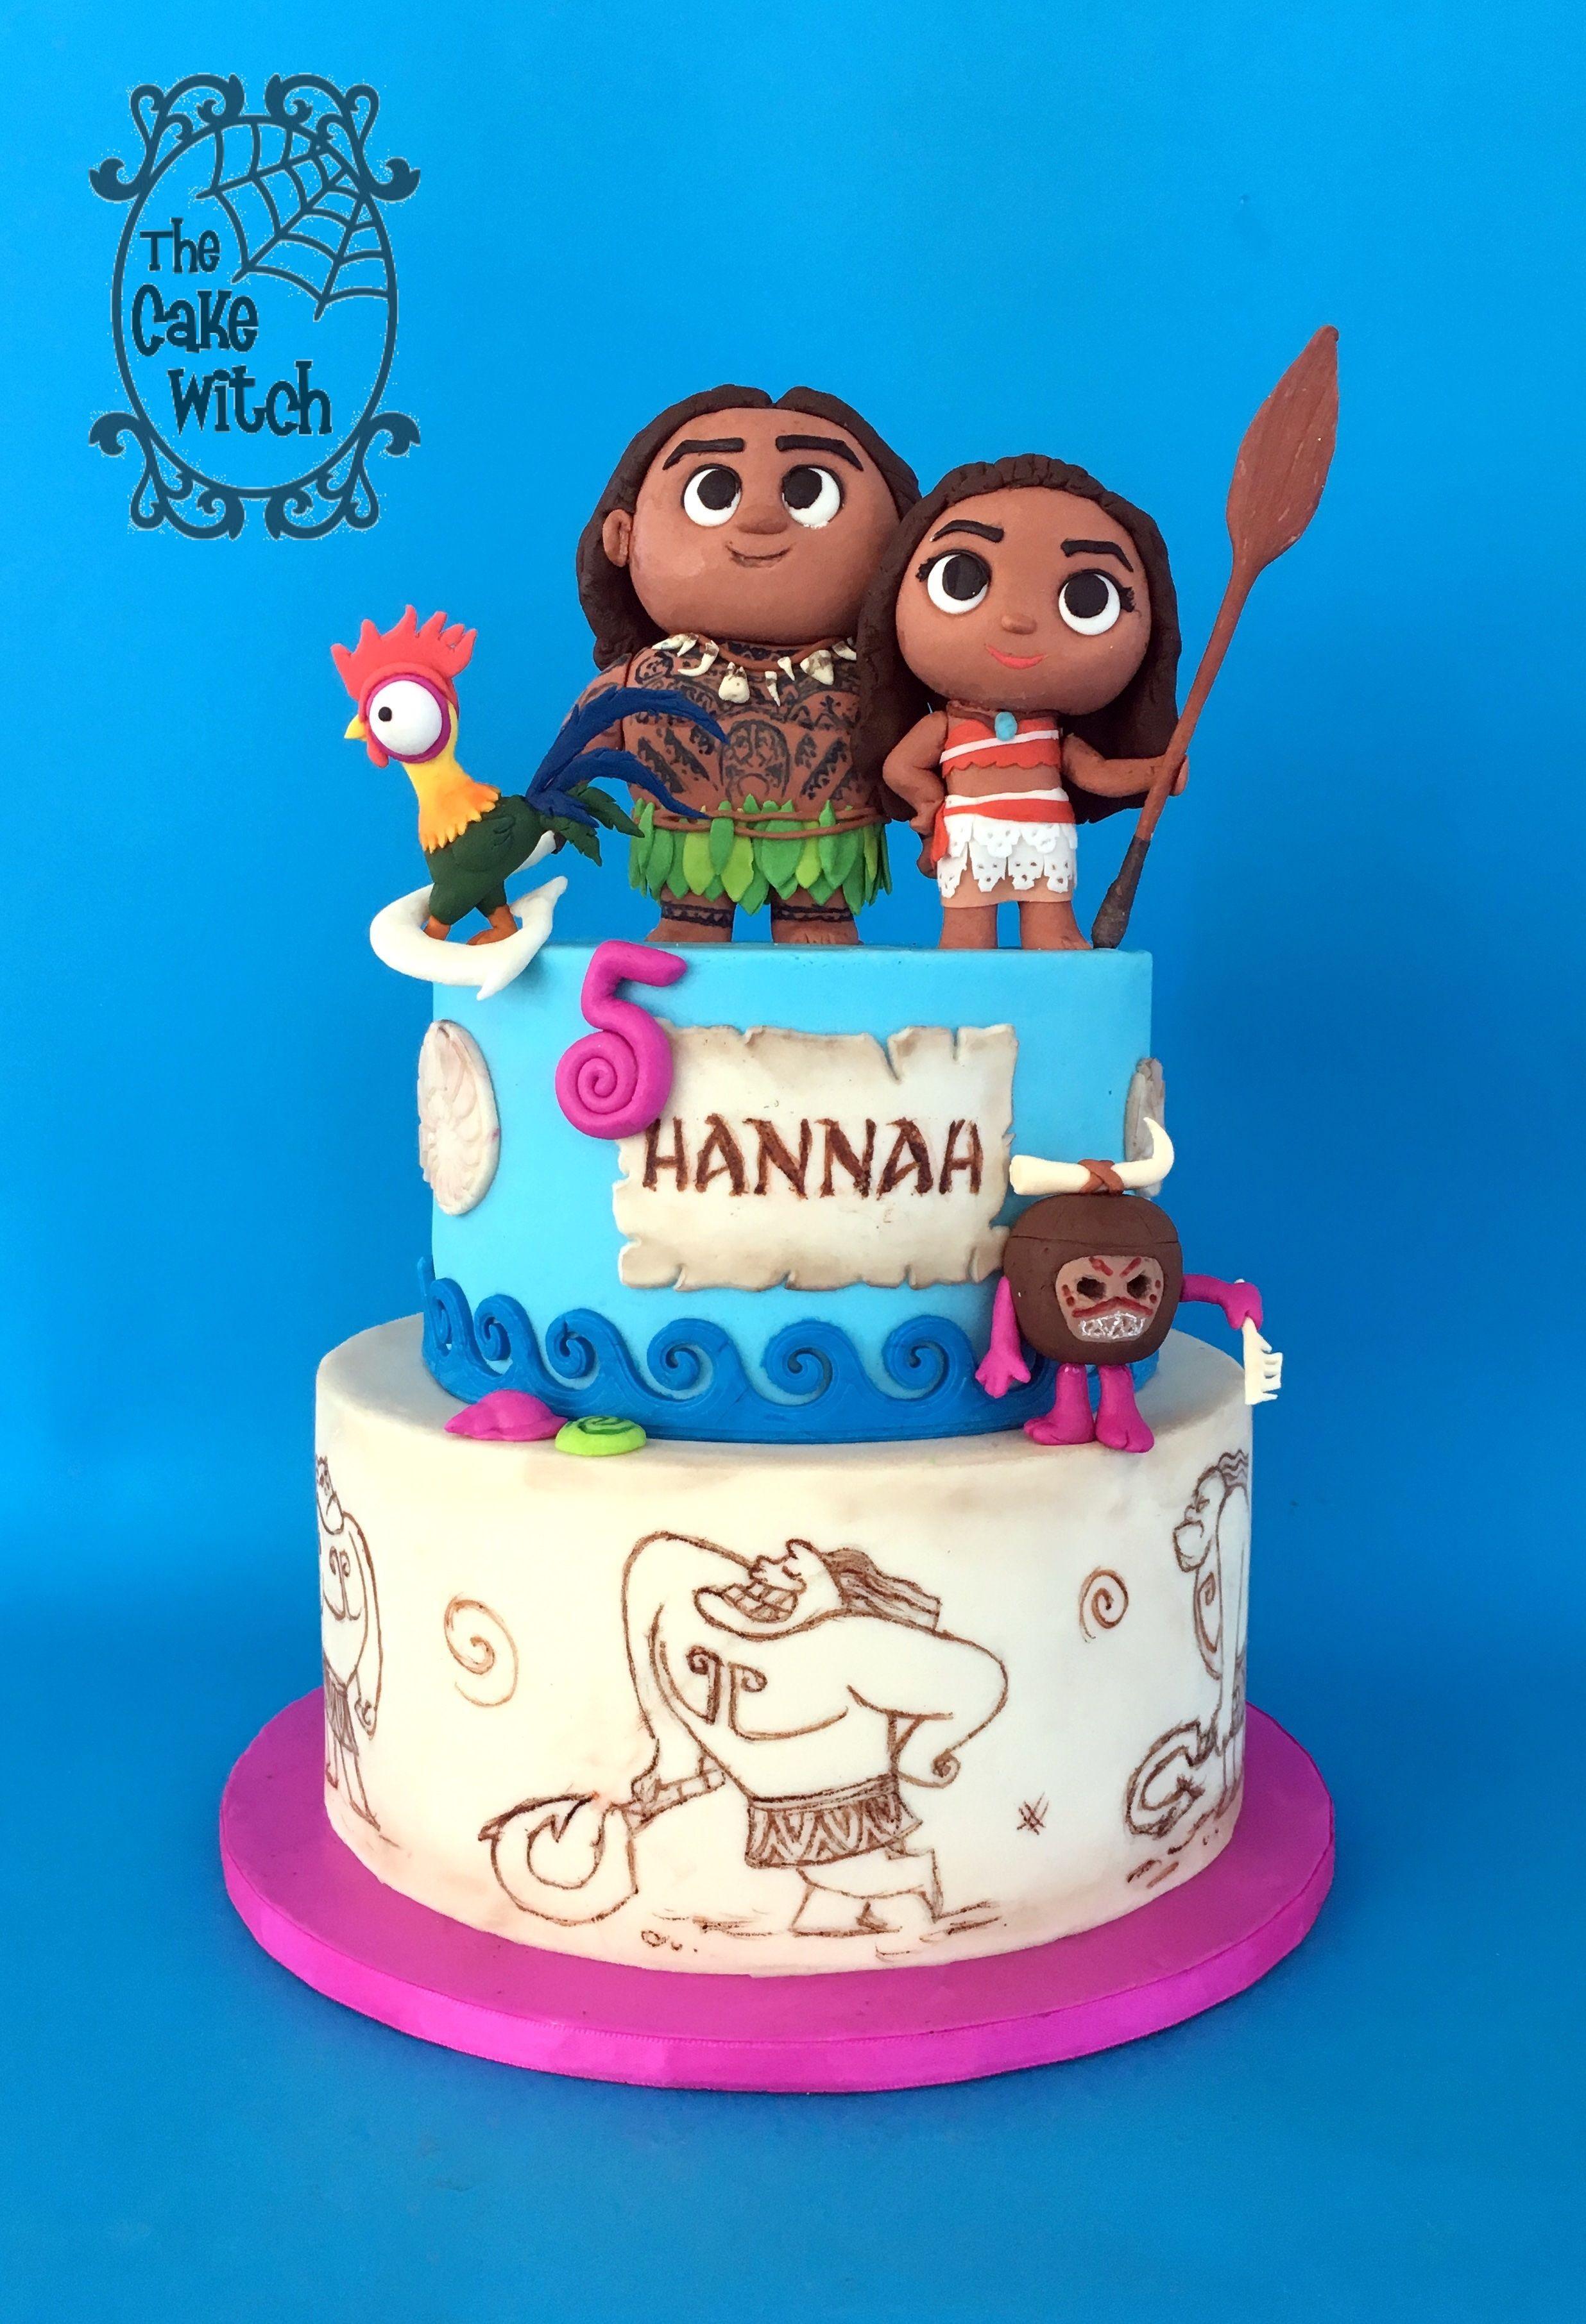 Moana Birthday Cake with HeyHey Maui and kakamora figurines The